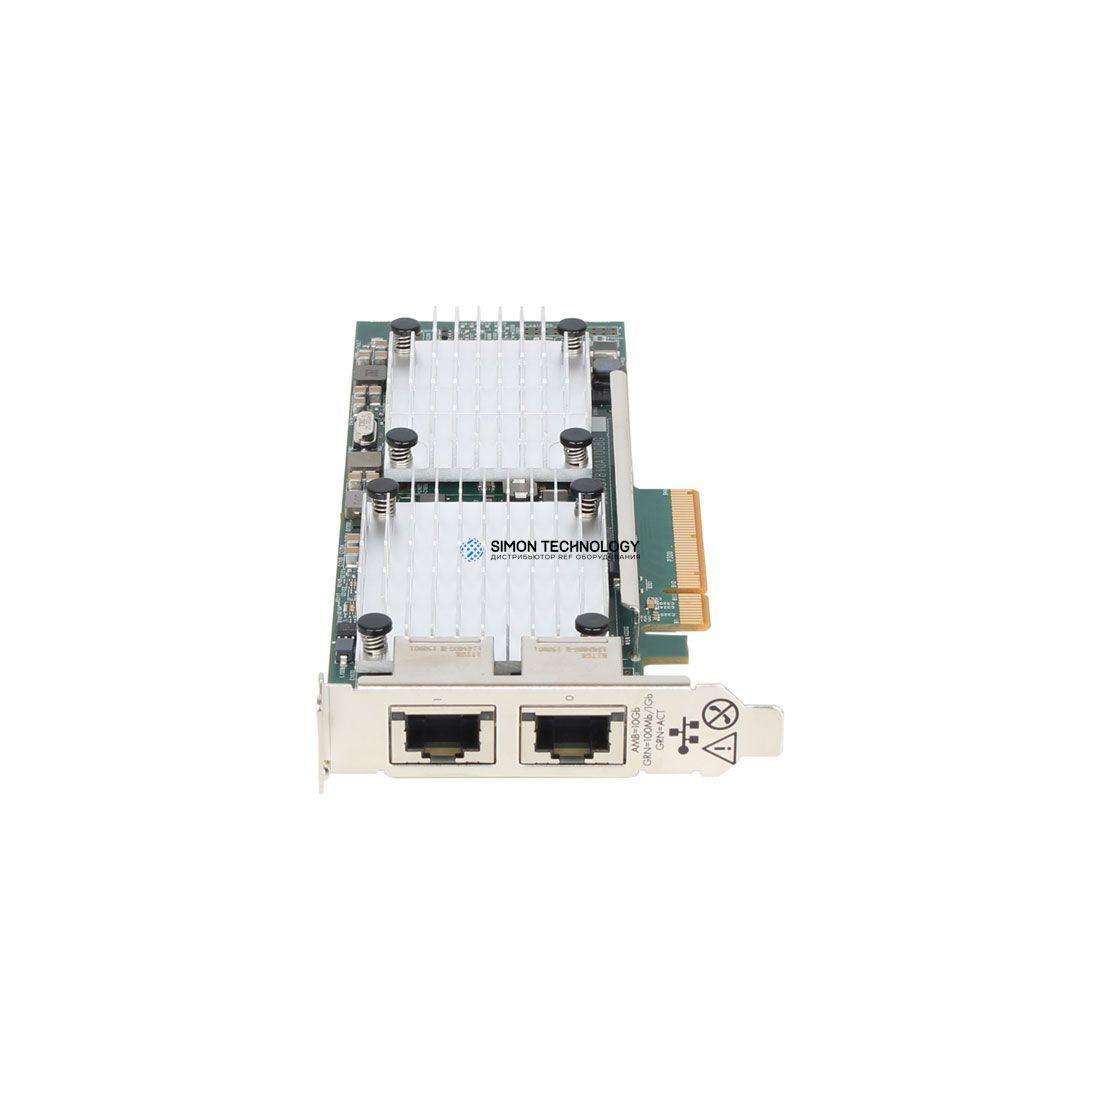 Сетевая карта HP ETHERNET 10GB 530T 2 PORT ADAPTER - WITH LOW PROFILE BRKT (656596-B21-LP)